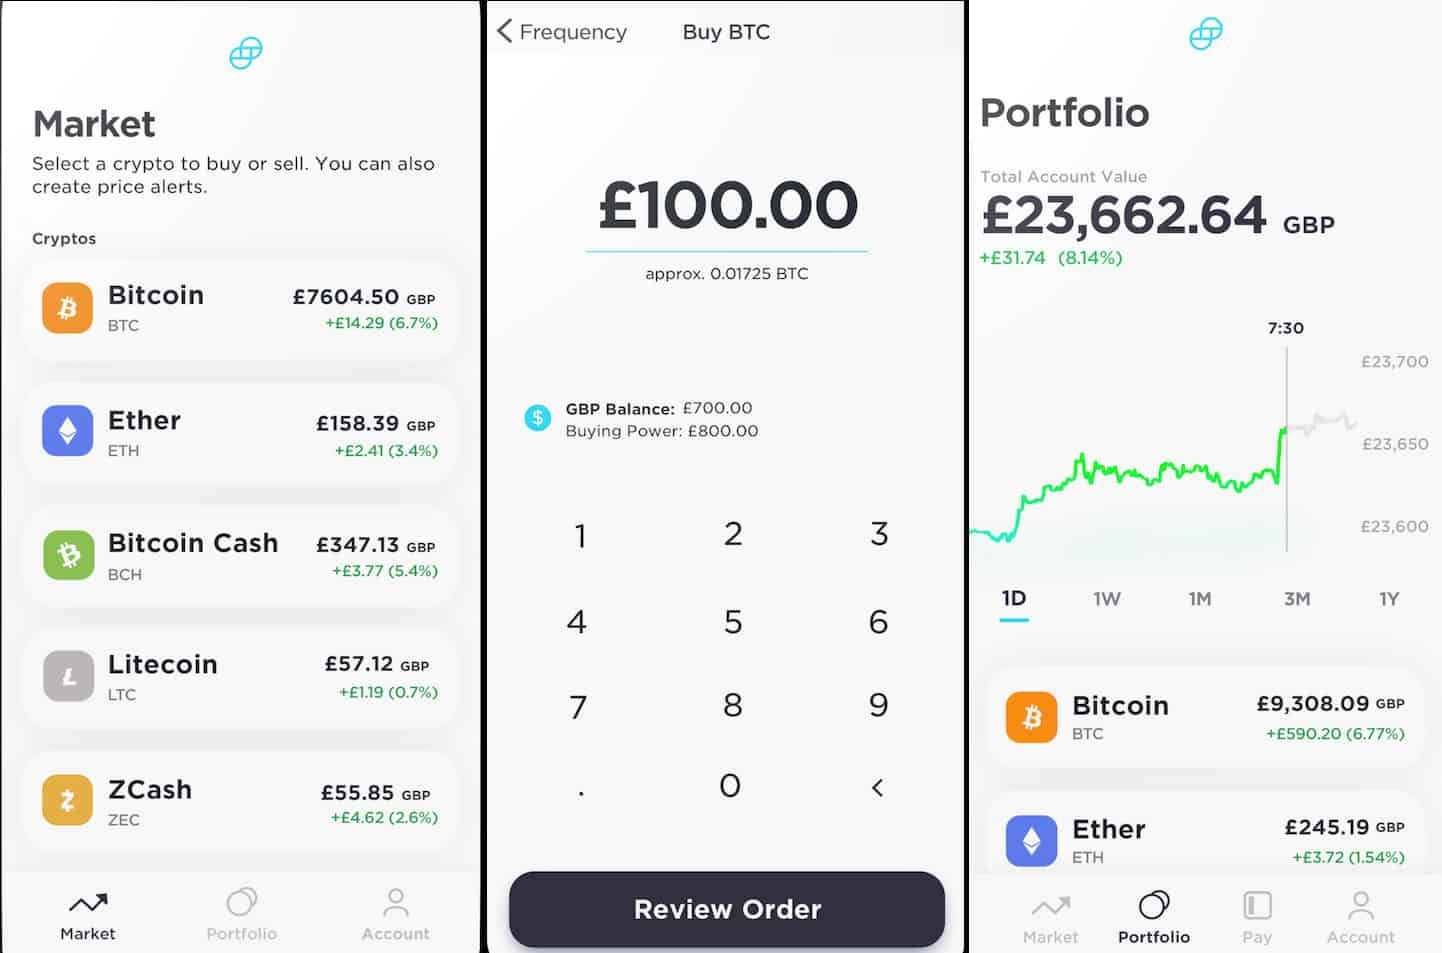 acquista bitcoin uk bank brussebal